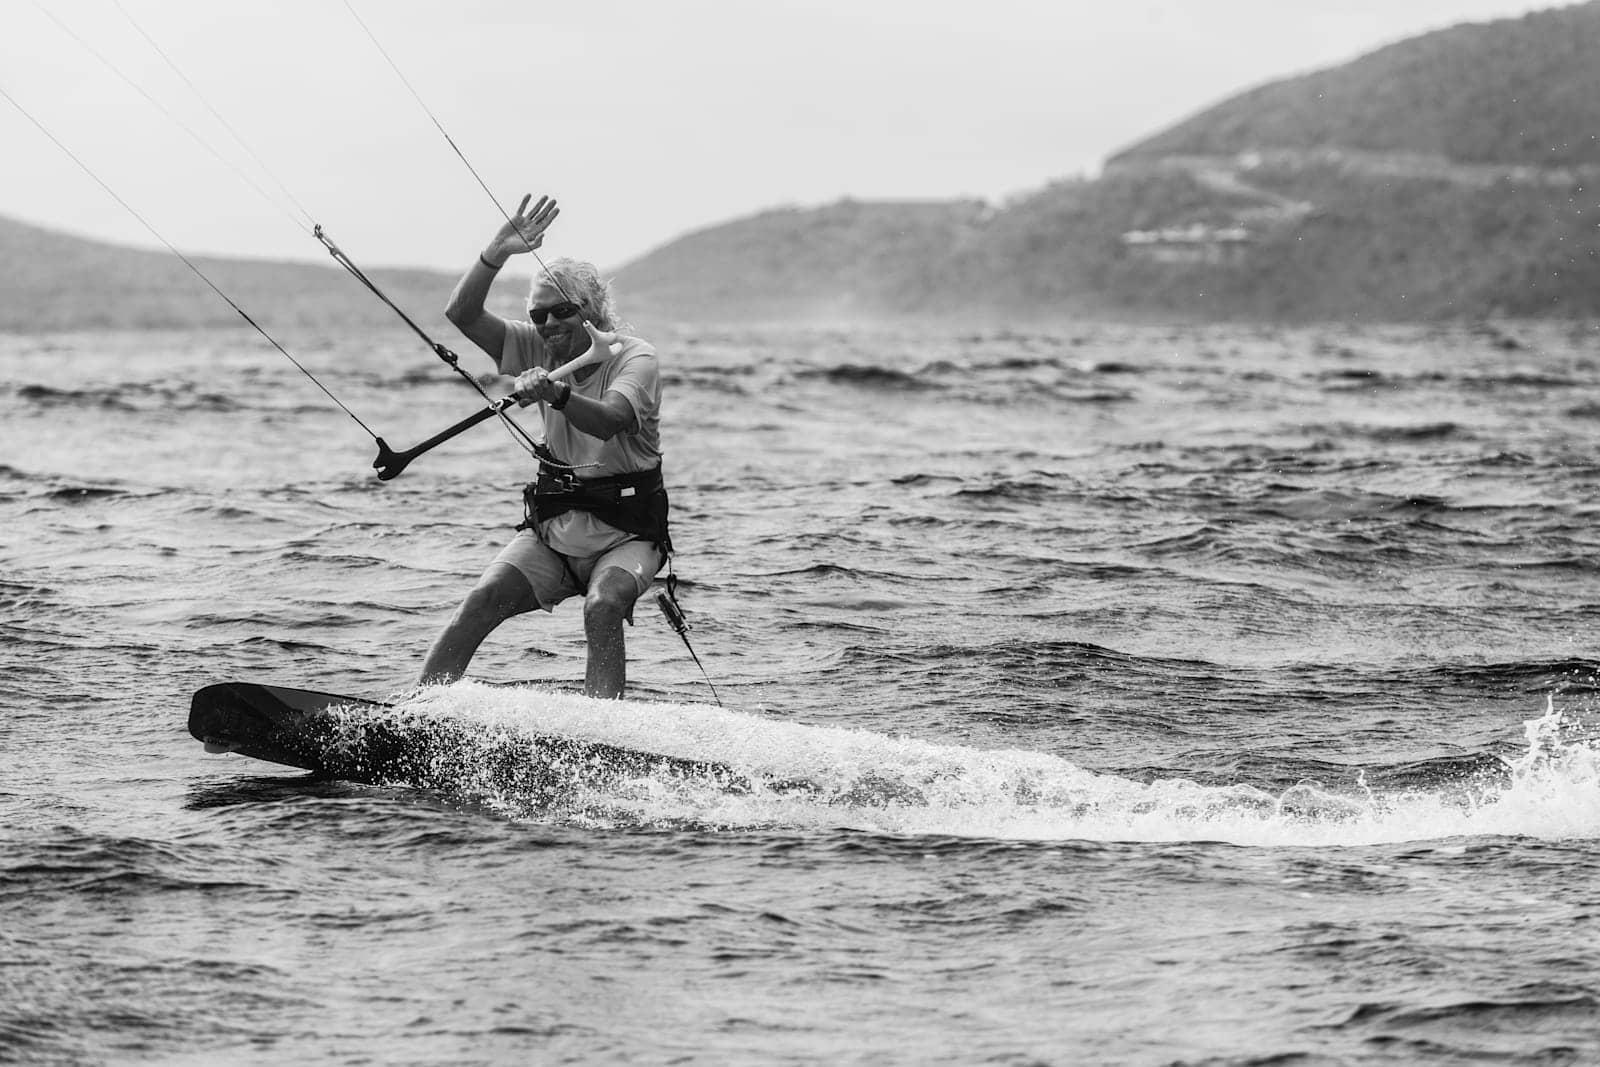 Richard Branson windsurfing